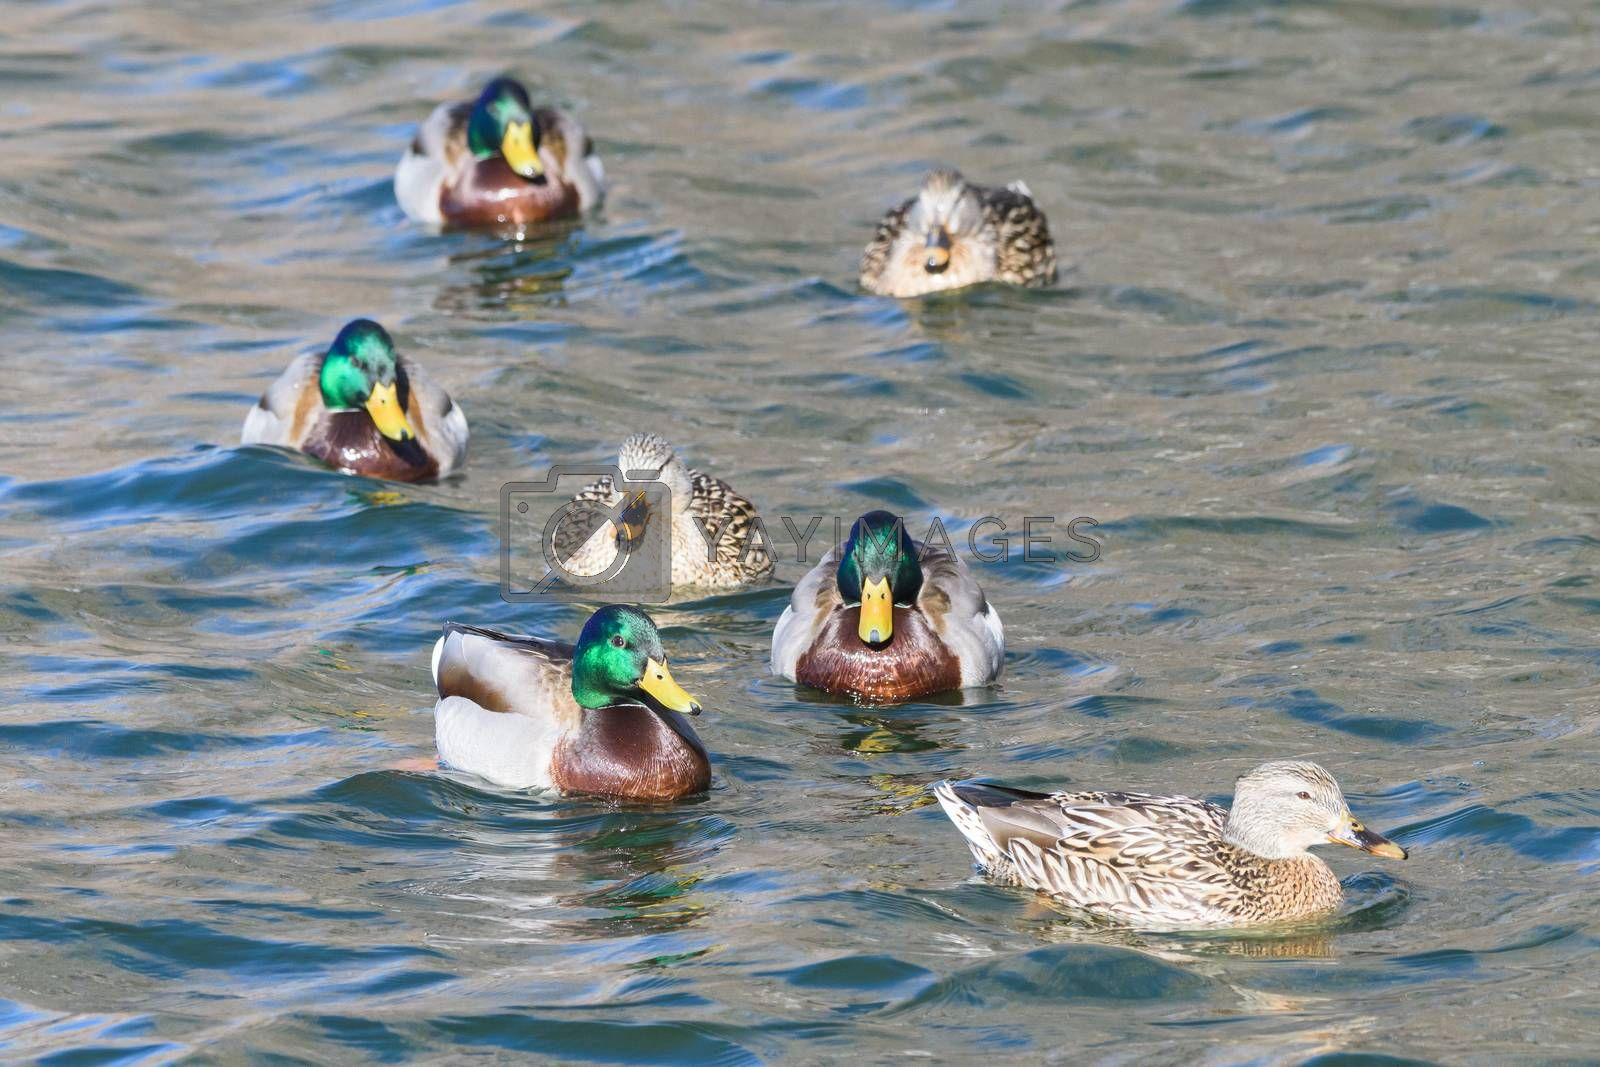 Common Waterfowl in Colorado. Mallard Duck Swimming in Water